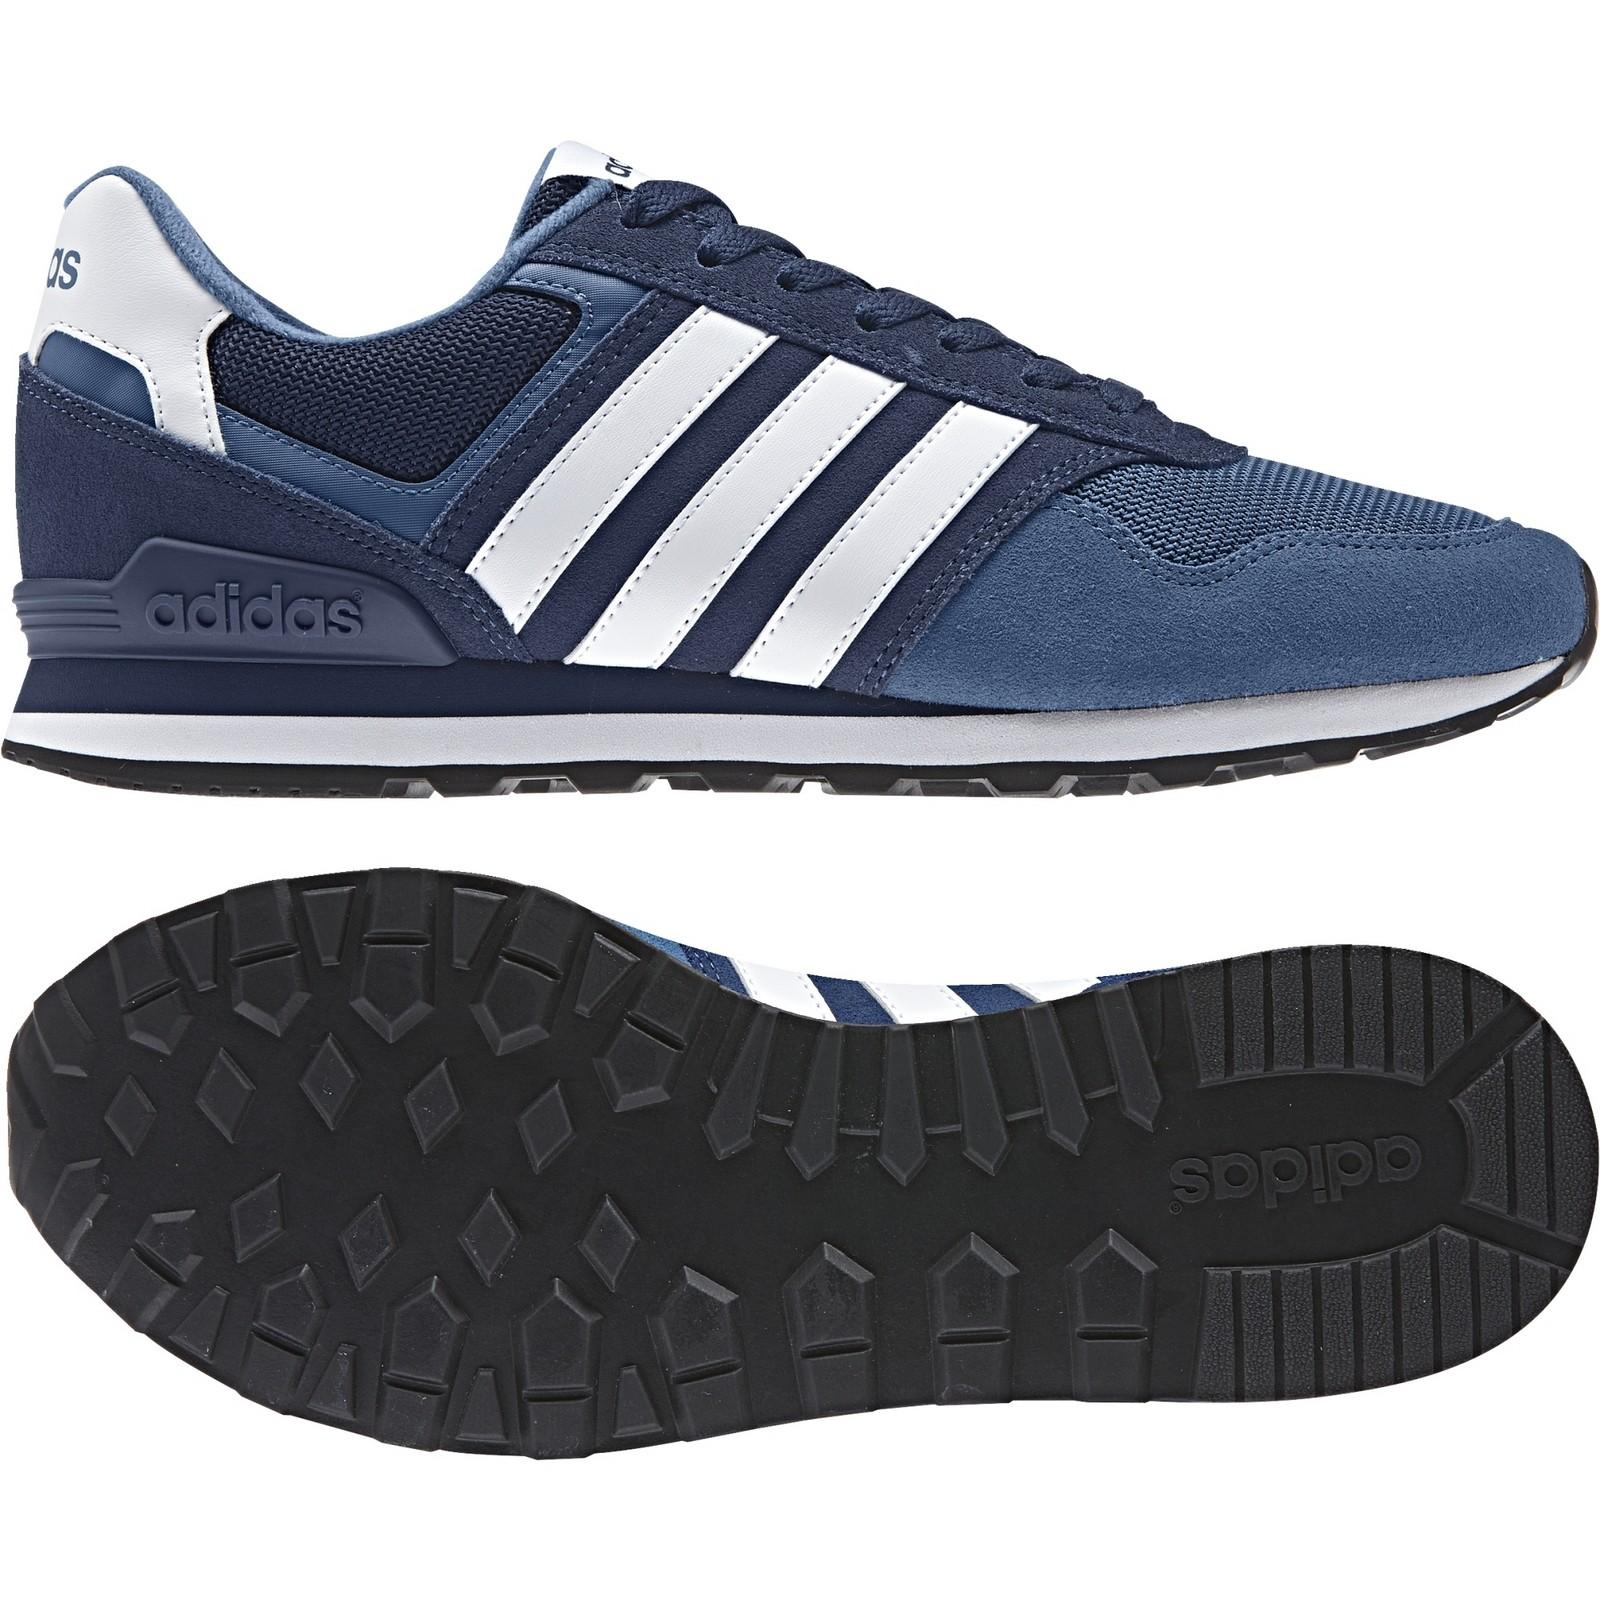 coupon code for adidas neo gray schuhe kit 7a6f8 59da9